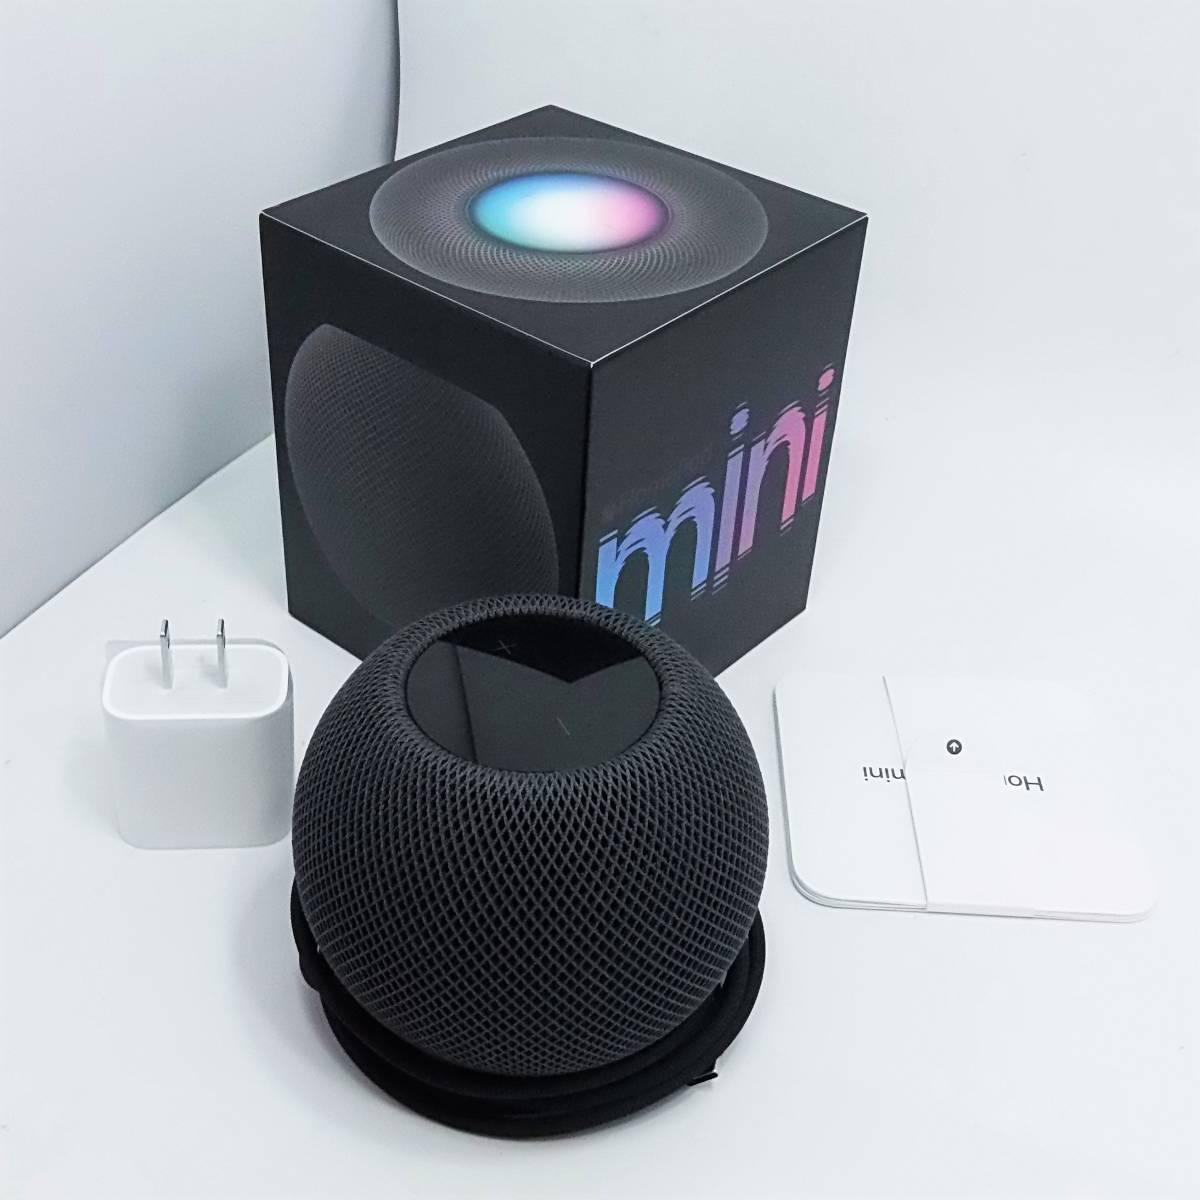 [Siri連携動作確認済み] アップル Apple ホームポッドミニ HomePod mini MY5G2J/A スペースグレイ_画像1